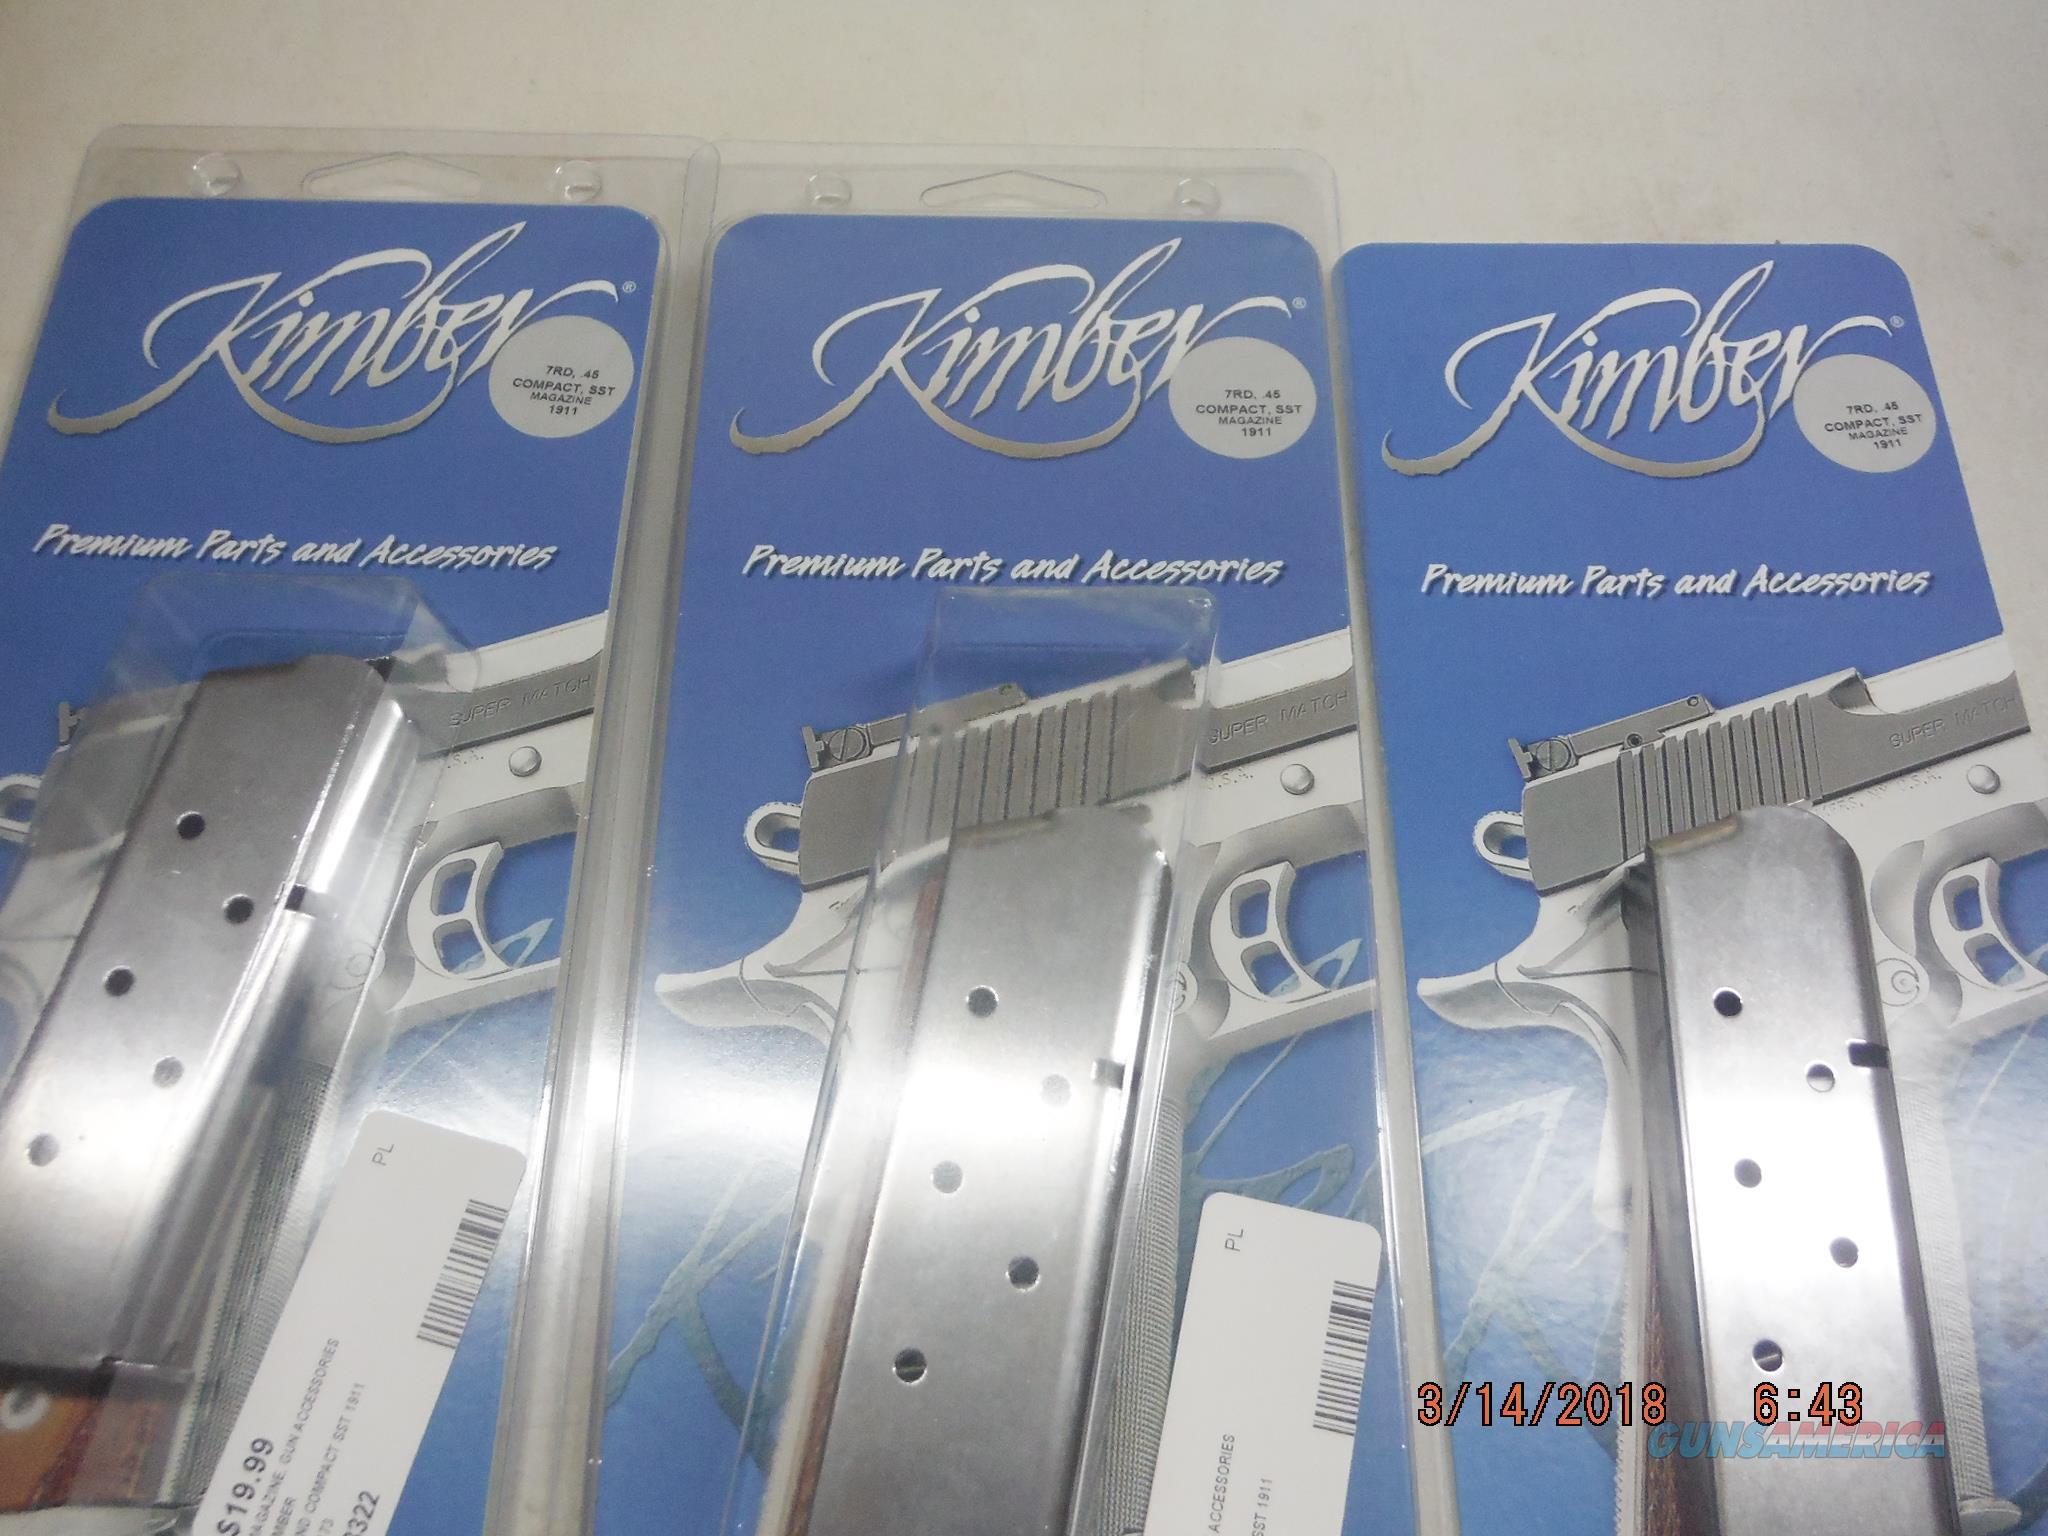 3 KIMBER 1911 Compact Mag 45 ACP 7Rd SS Factory Kimber  Non-Guns > Magazines & Clips > Pistol Magazines > 1911